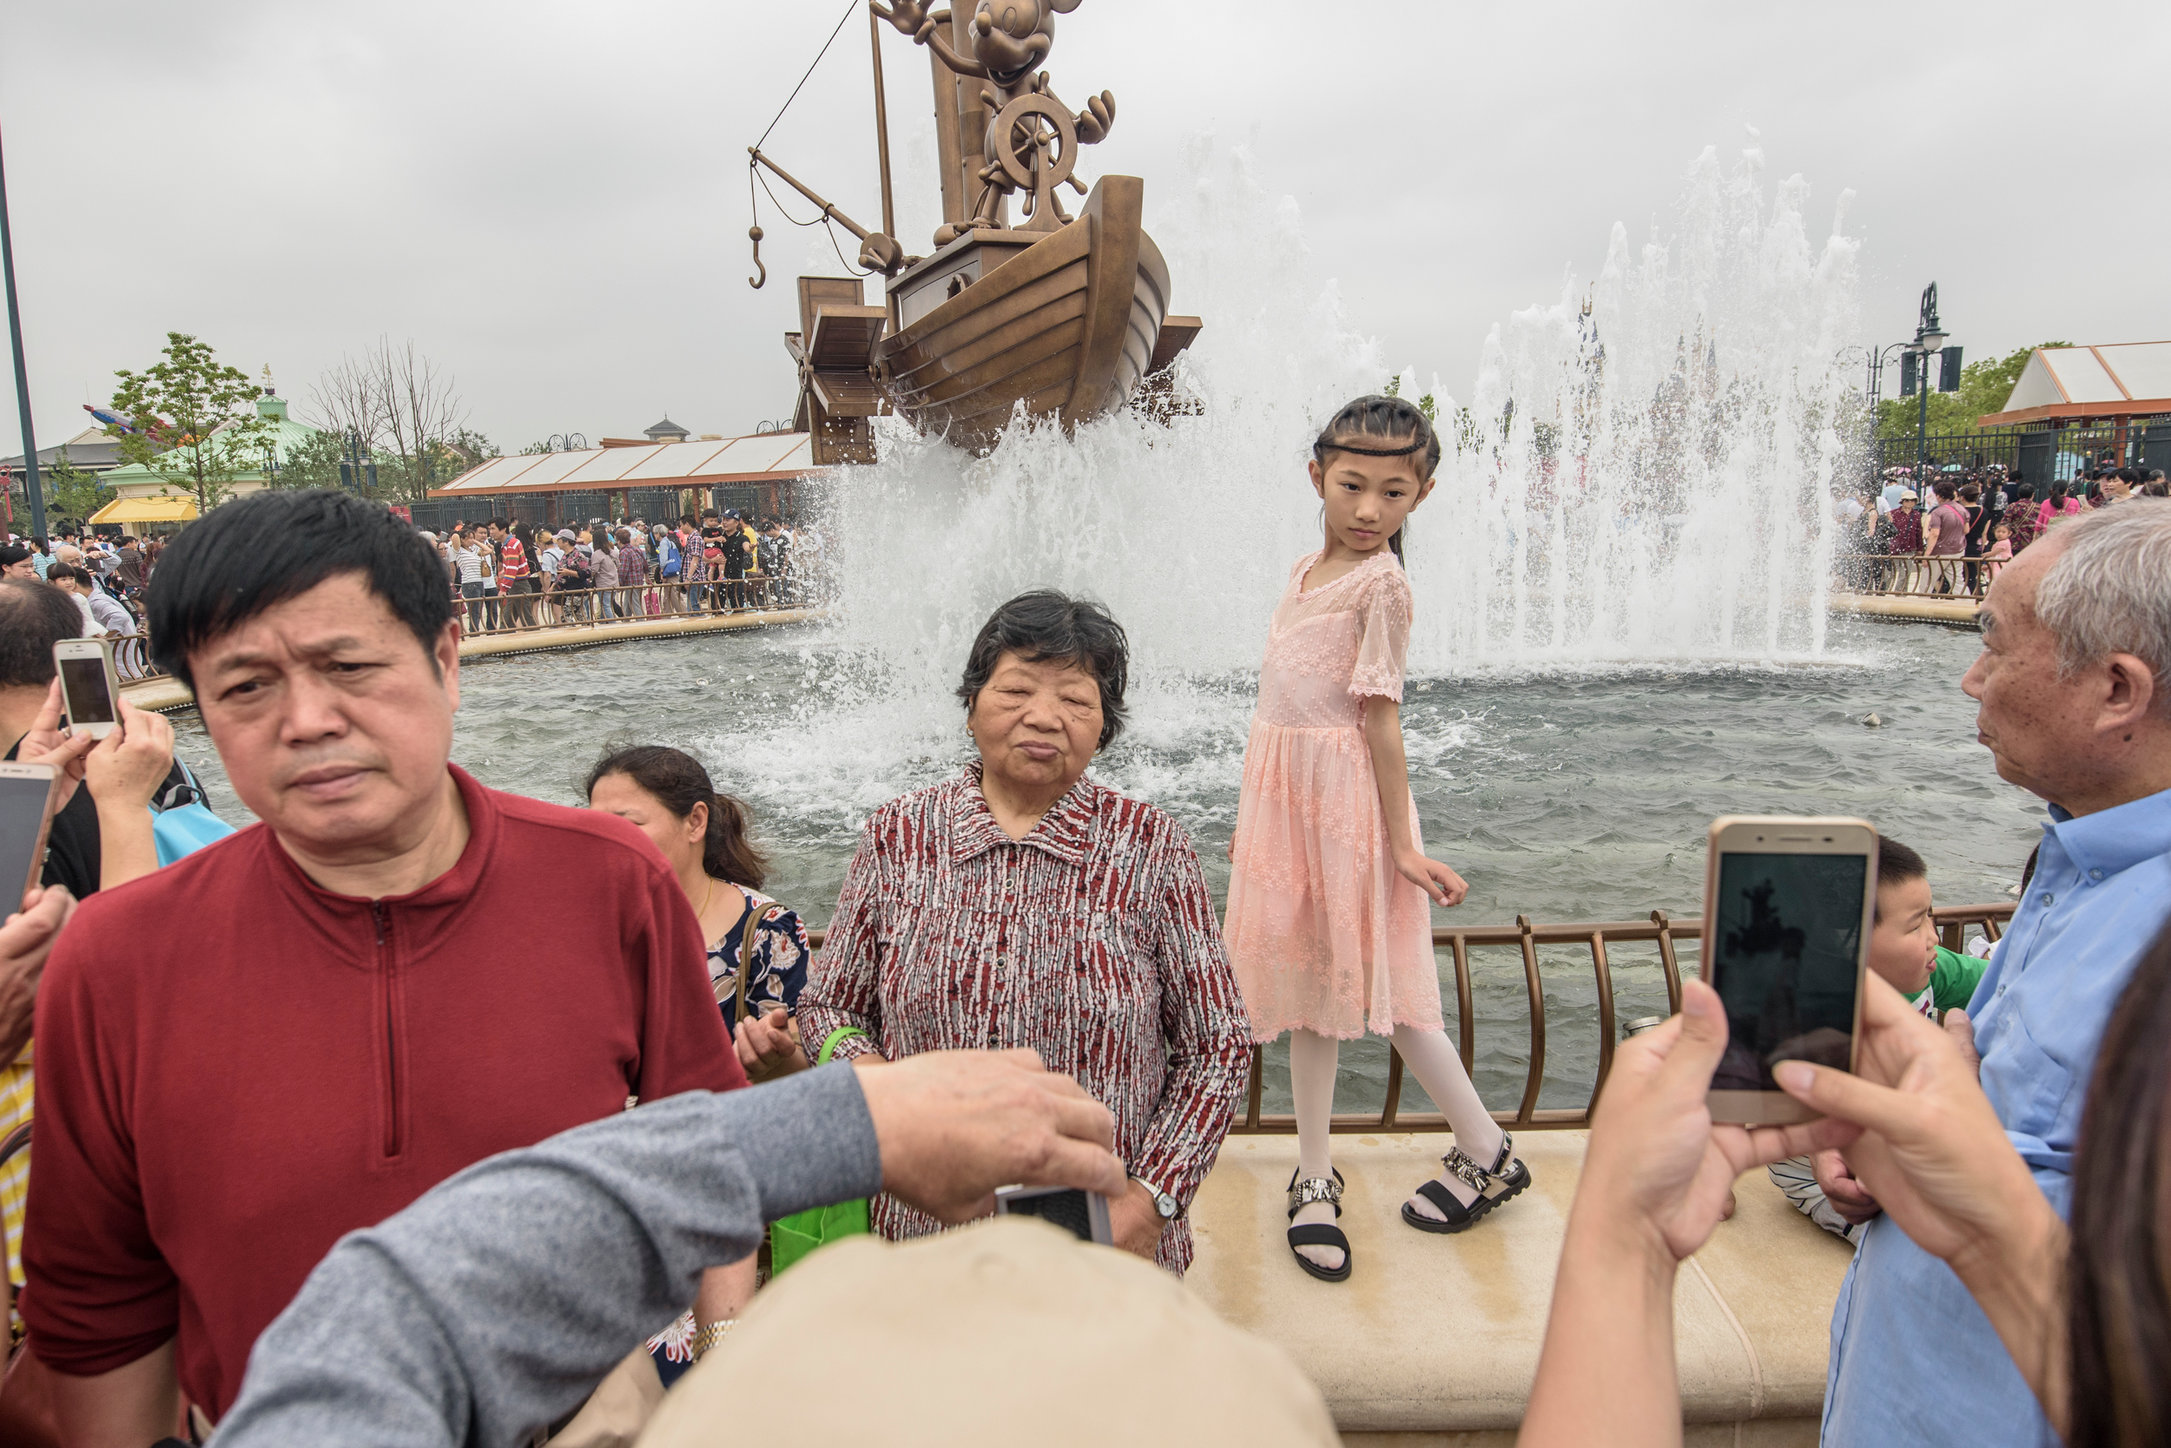 DisneylandShanghai0021.jpg